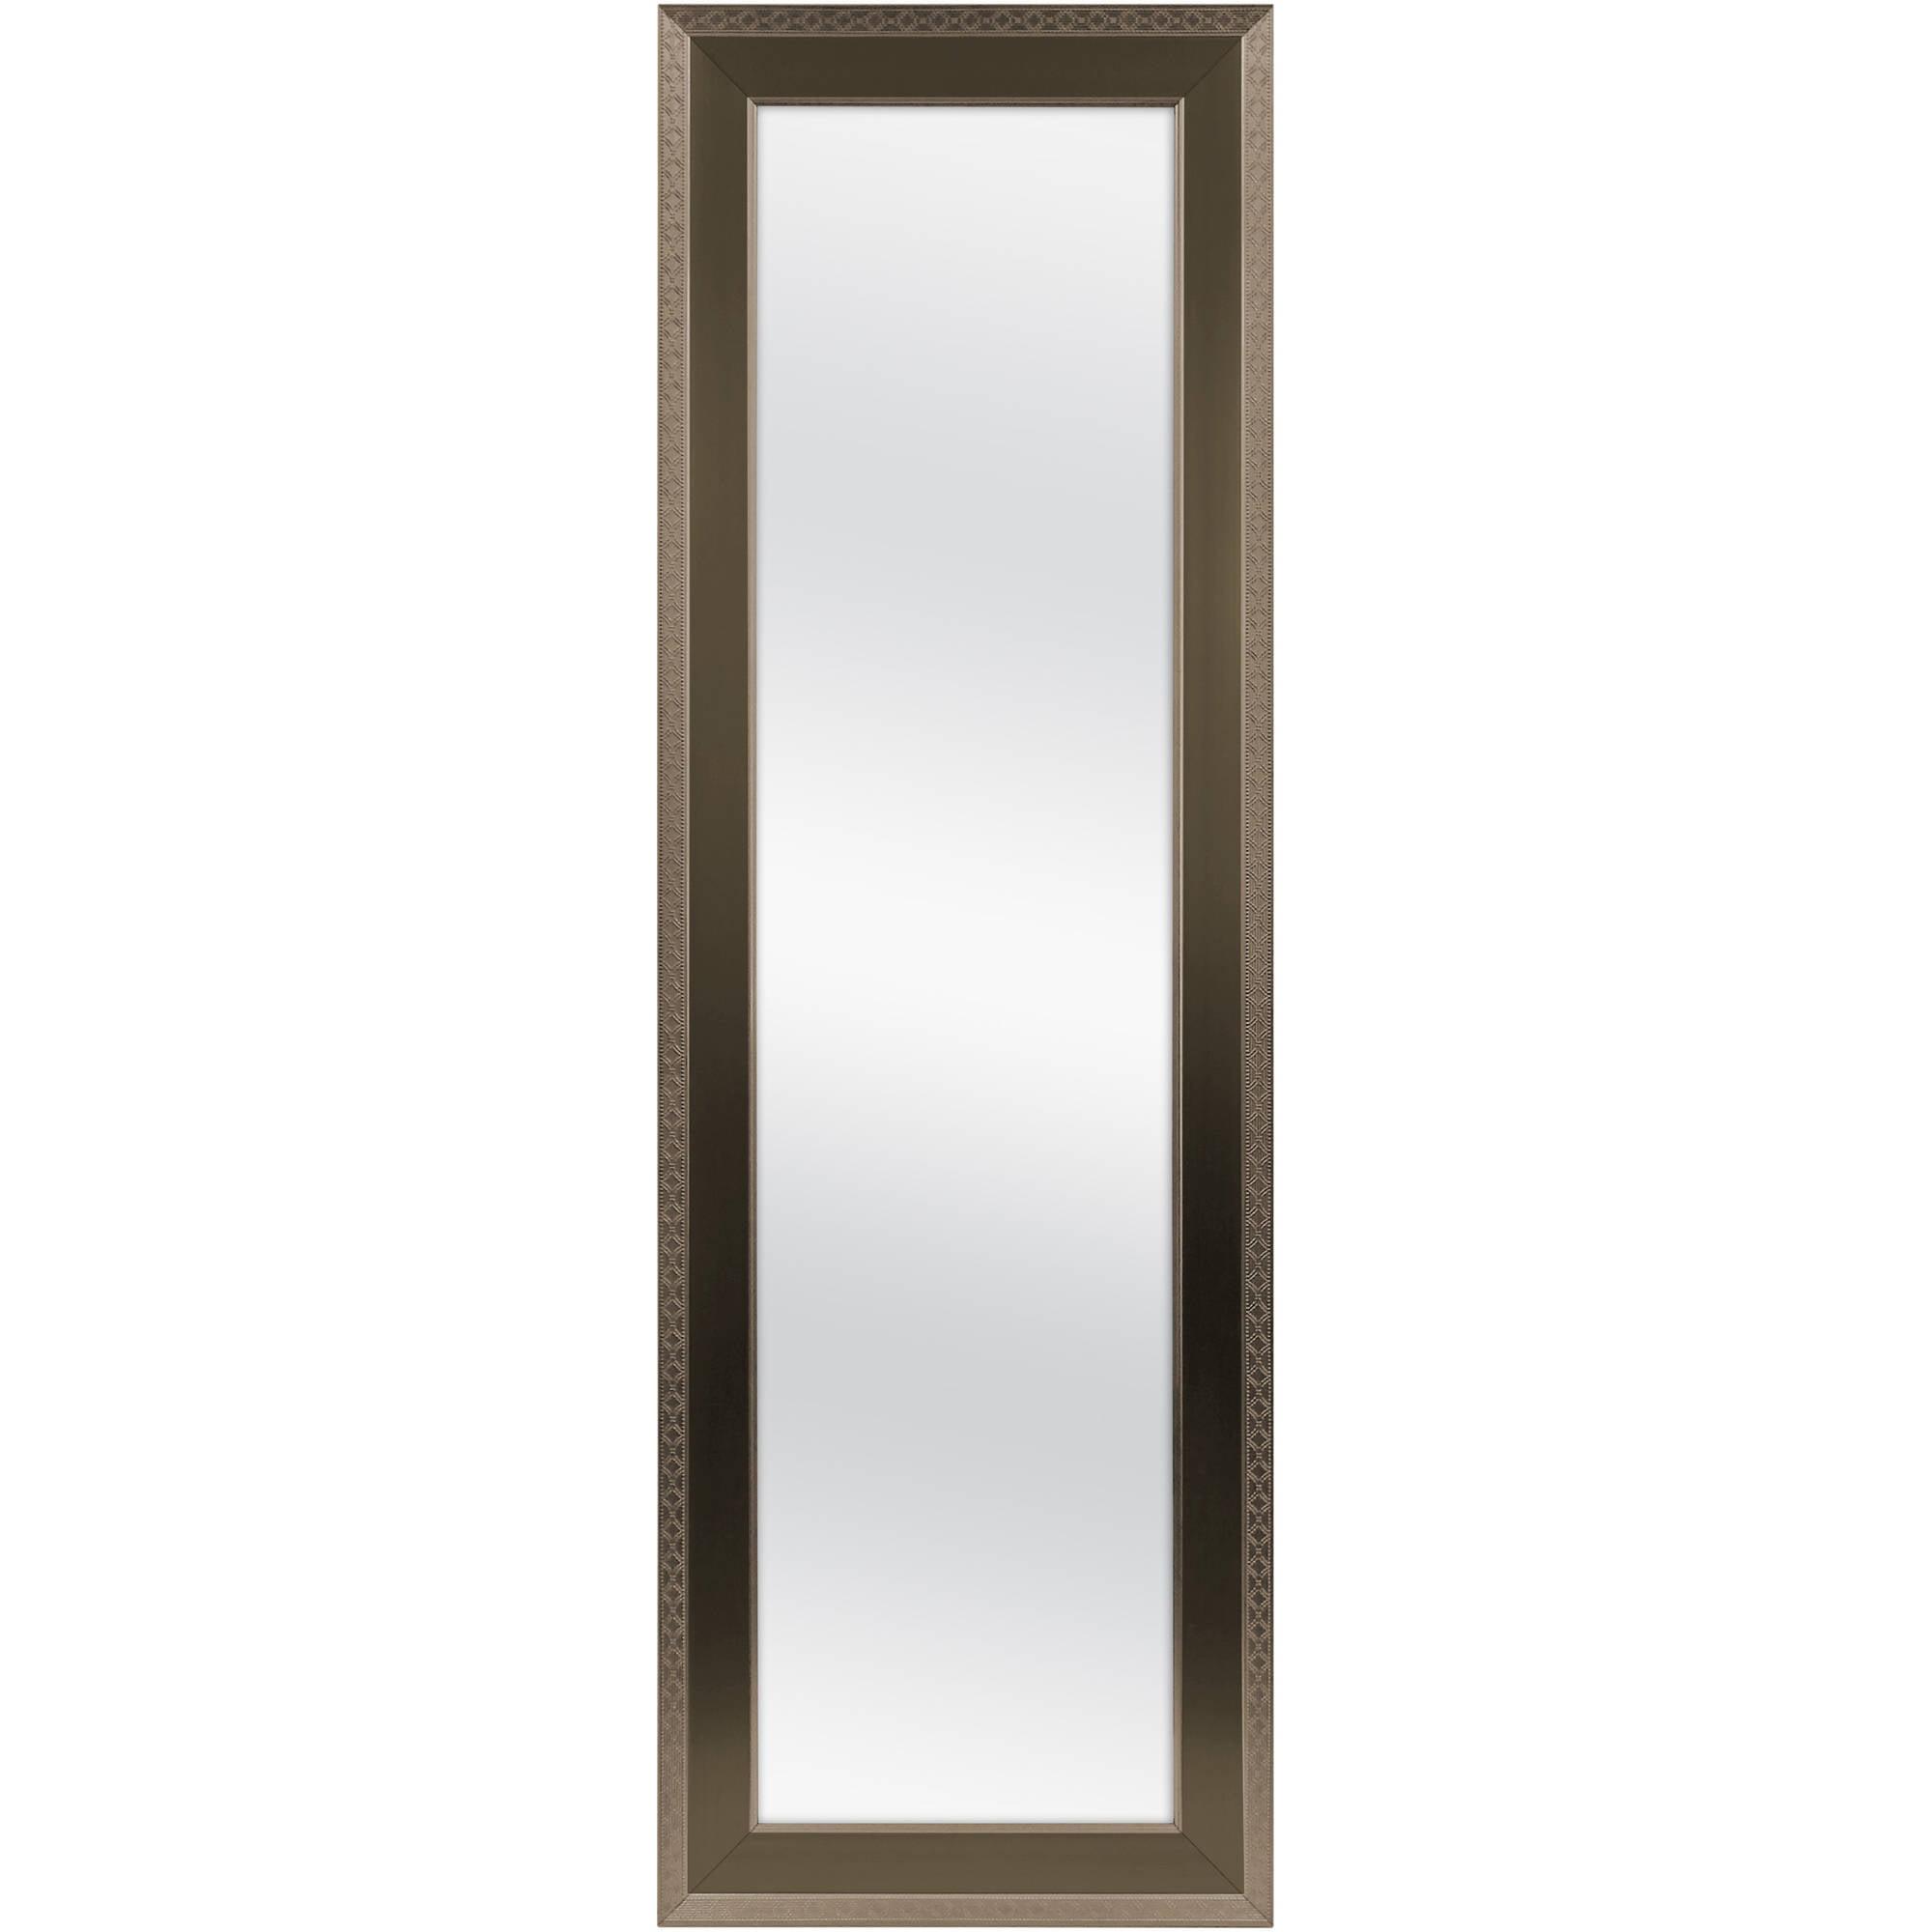 Over The Door Mirrors Over The Door Mirrors